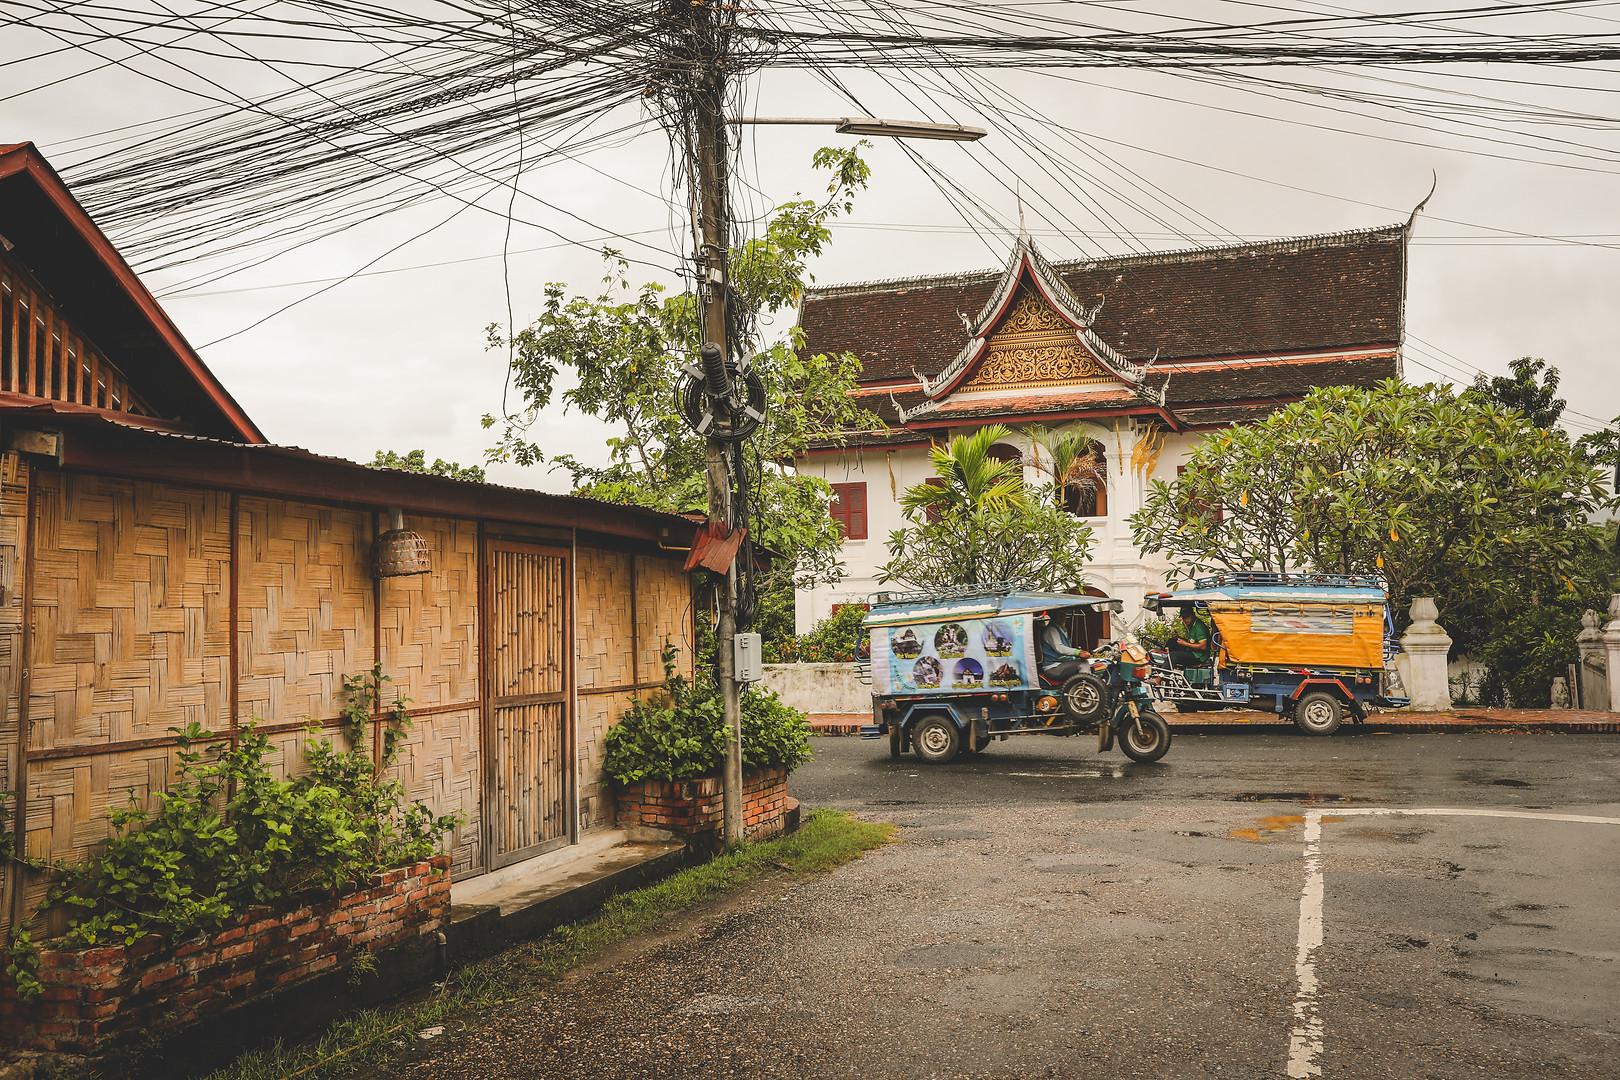 Streets of Luang Prabang